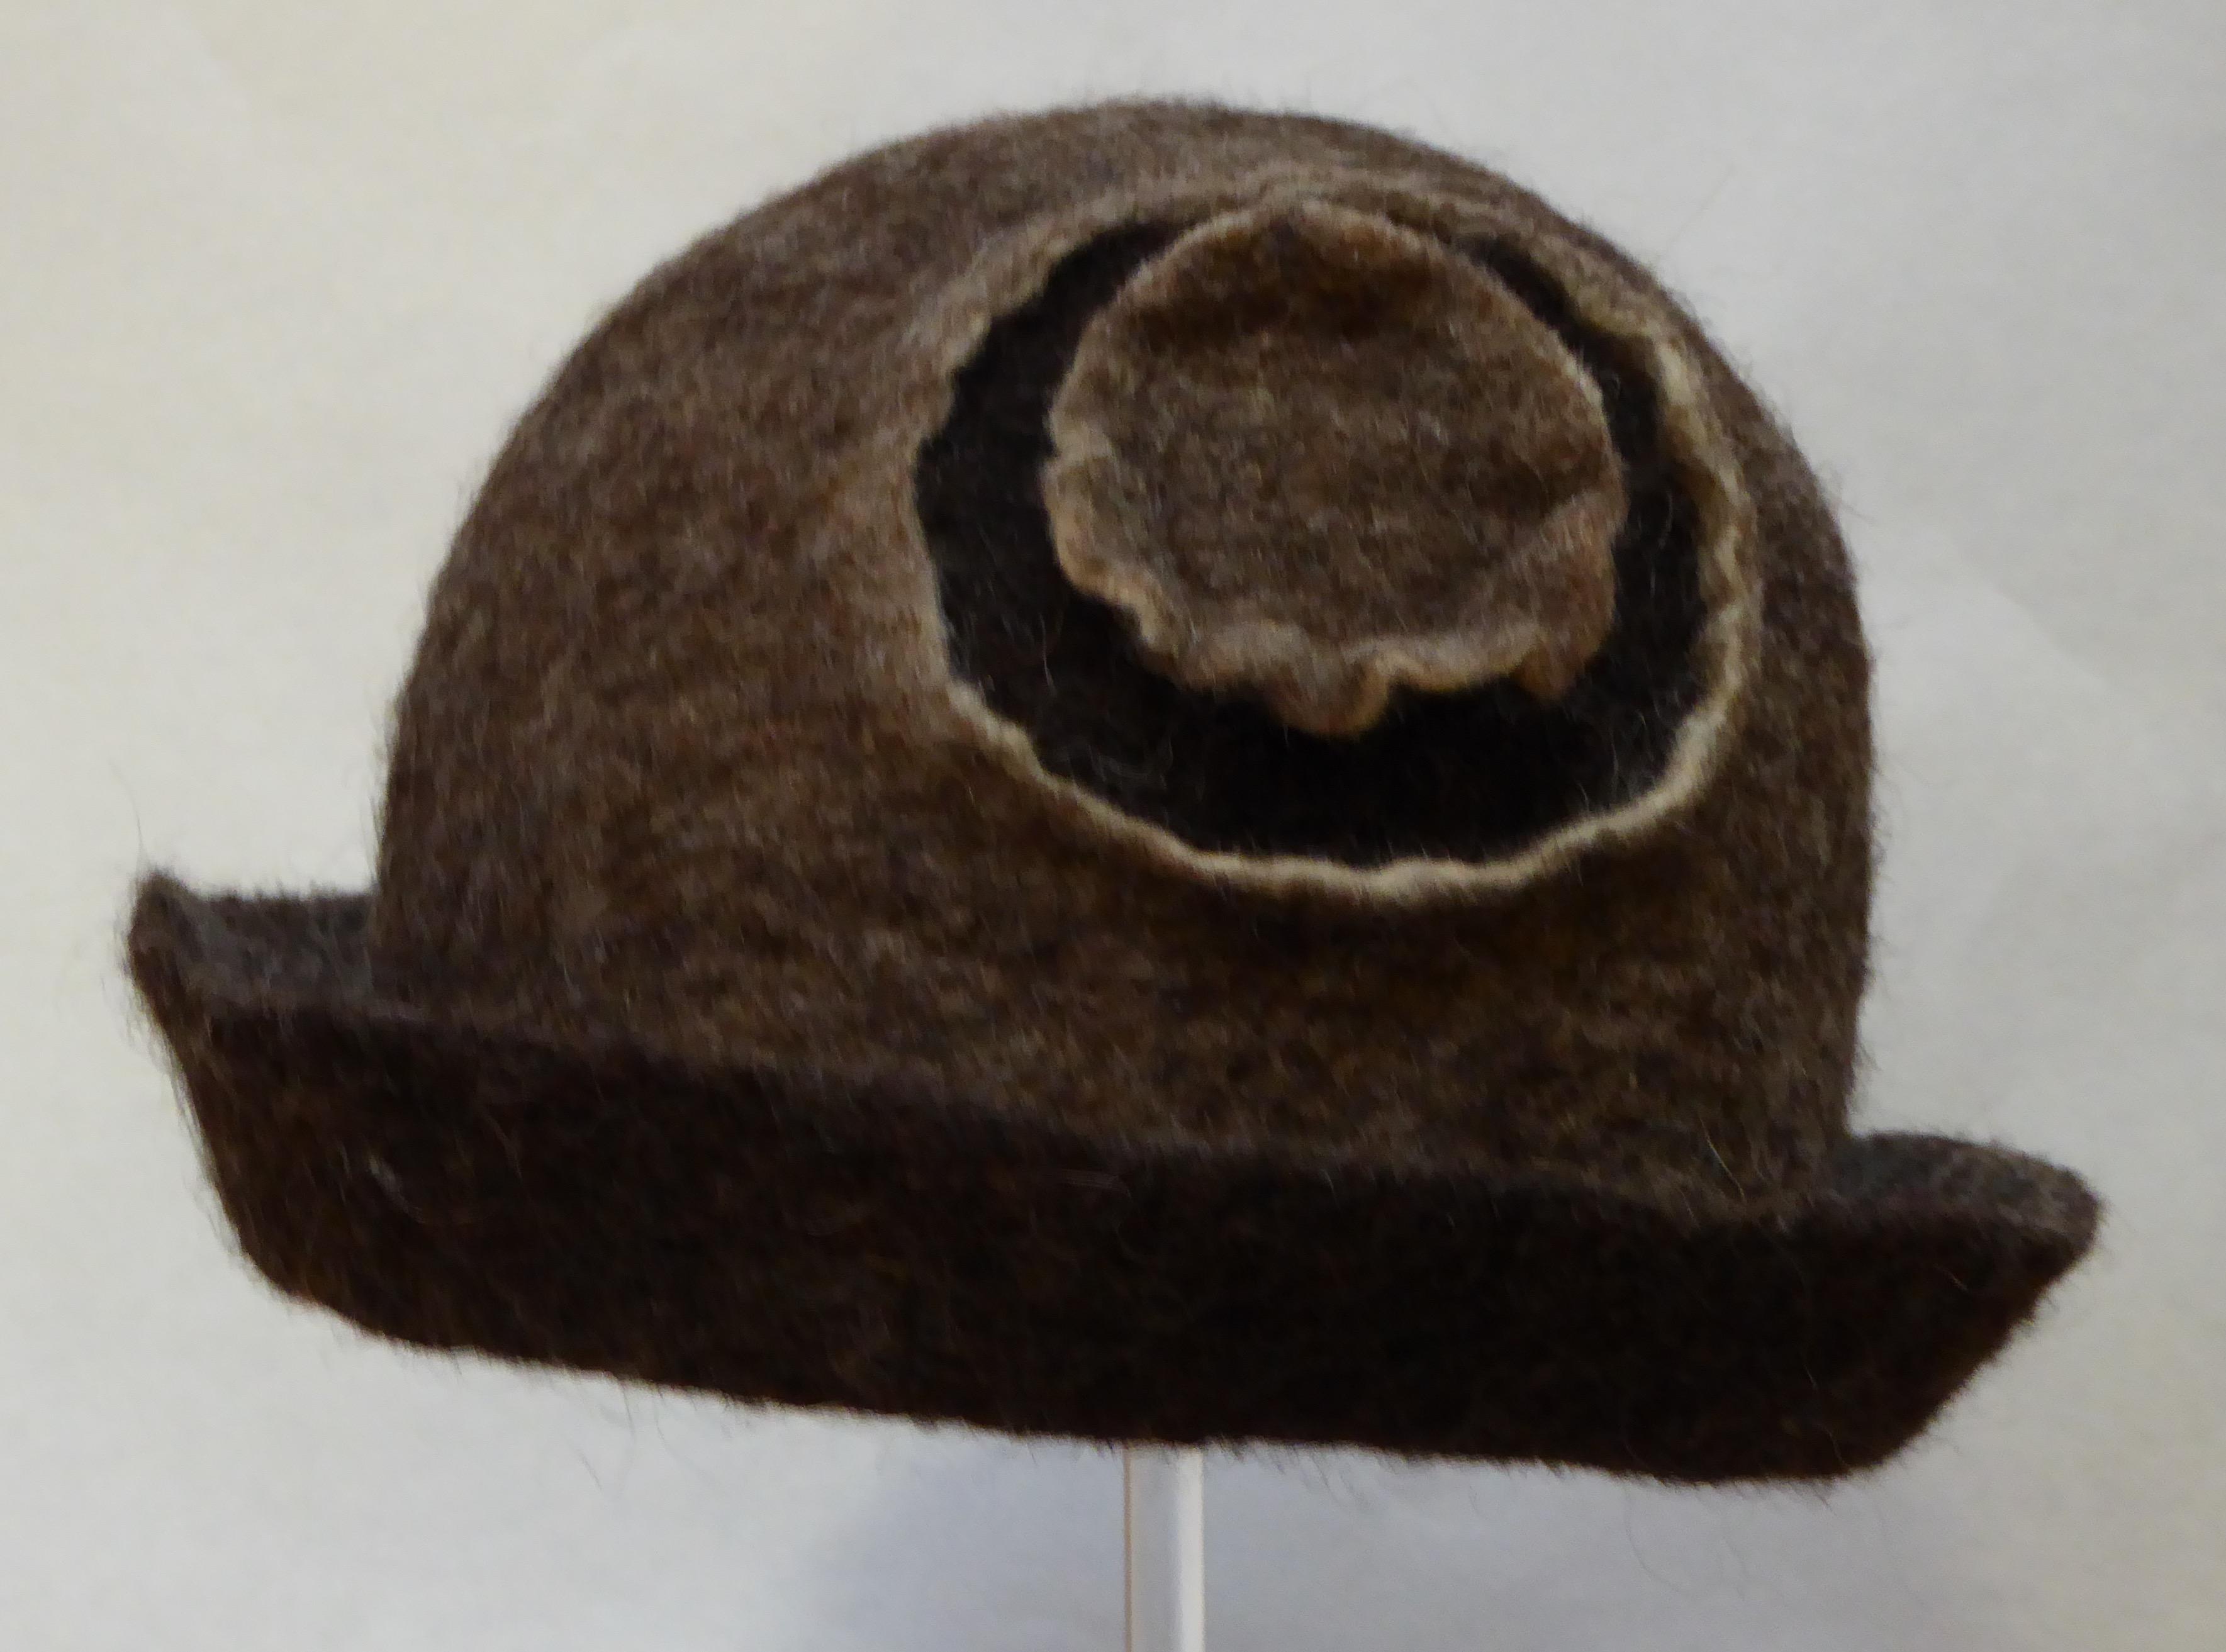 Felt Hat workshop with Mandy Nash - International Feltmakers Association